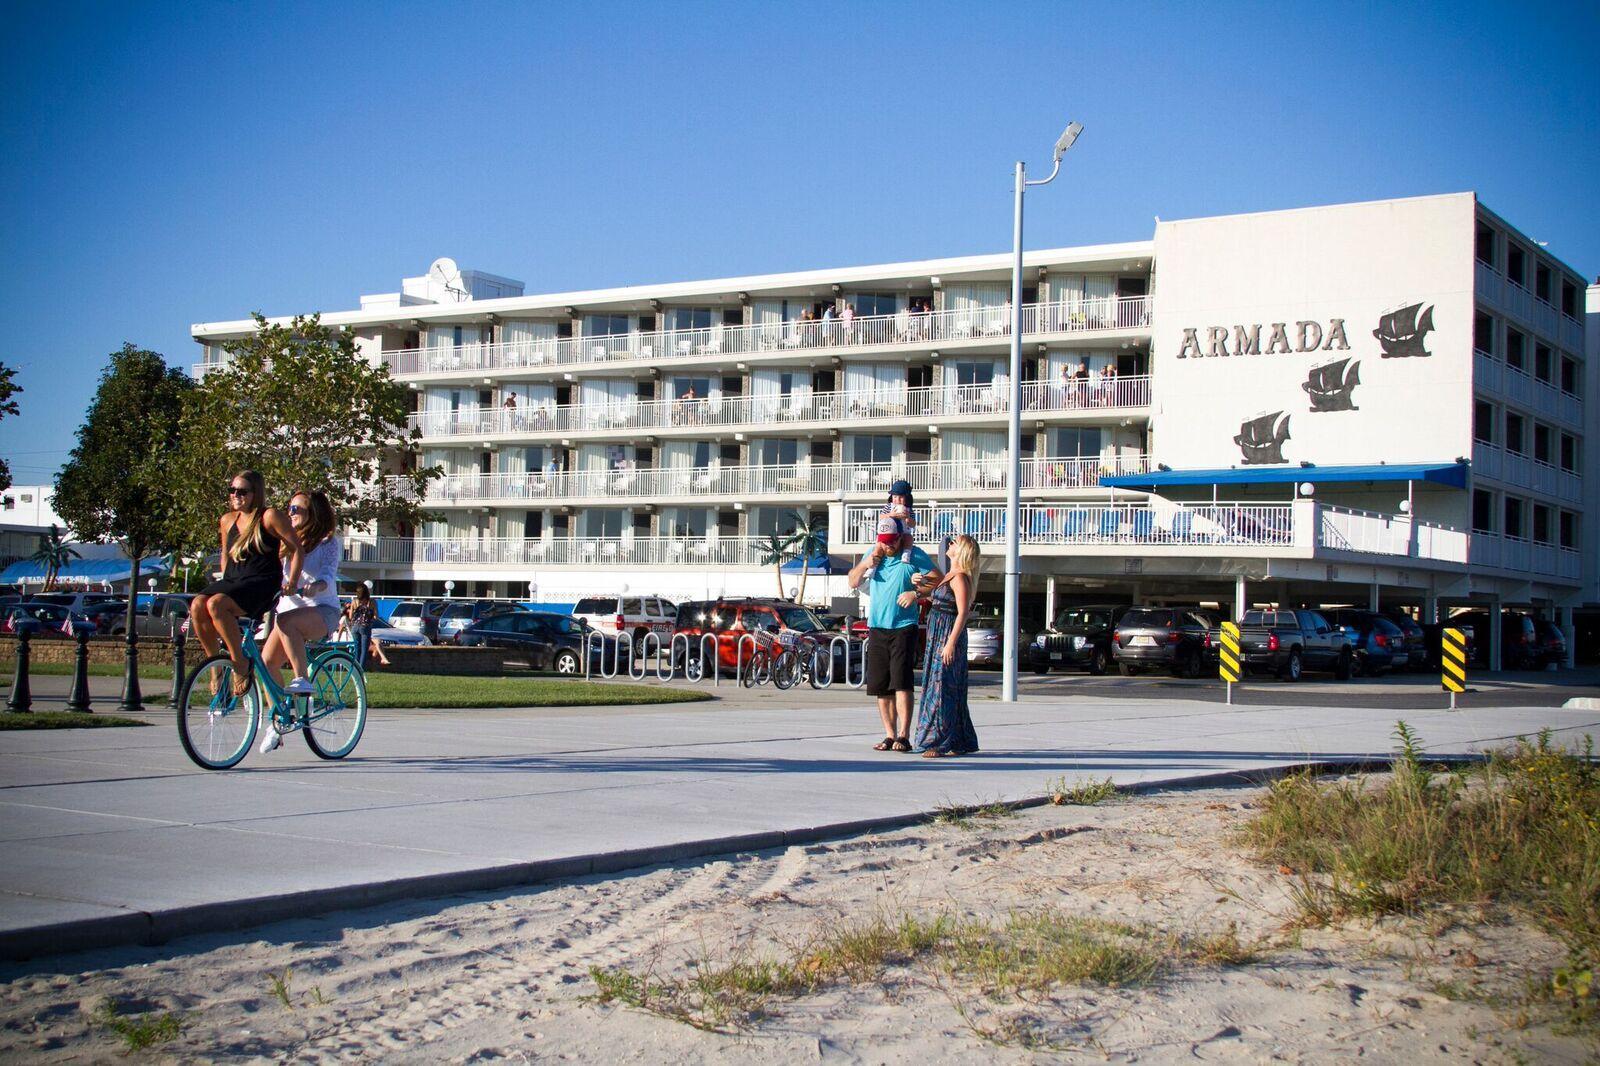 Armada By The Sea Beachfront Hotel In Wildwood Nj